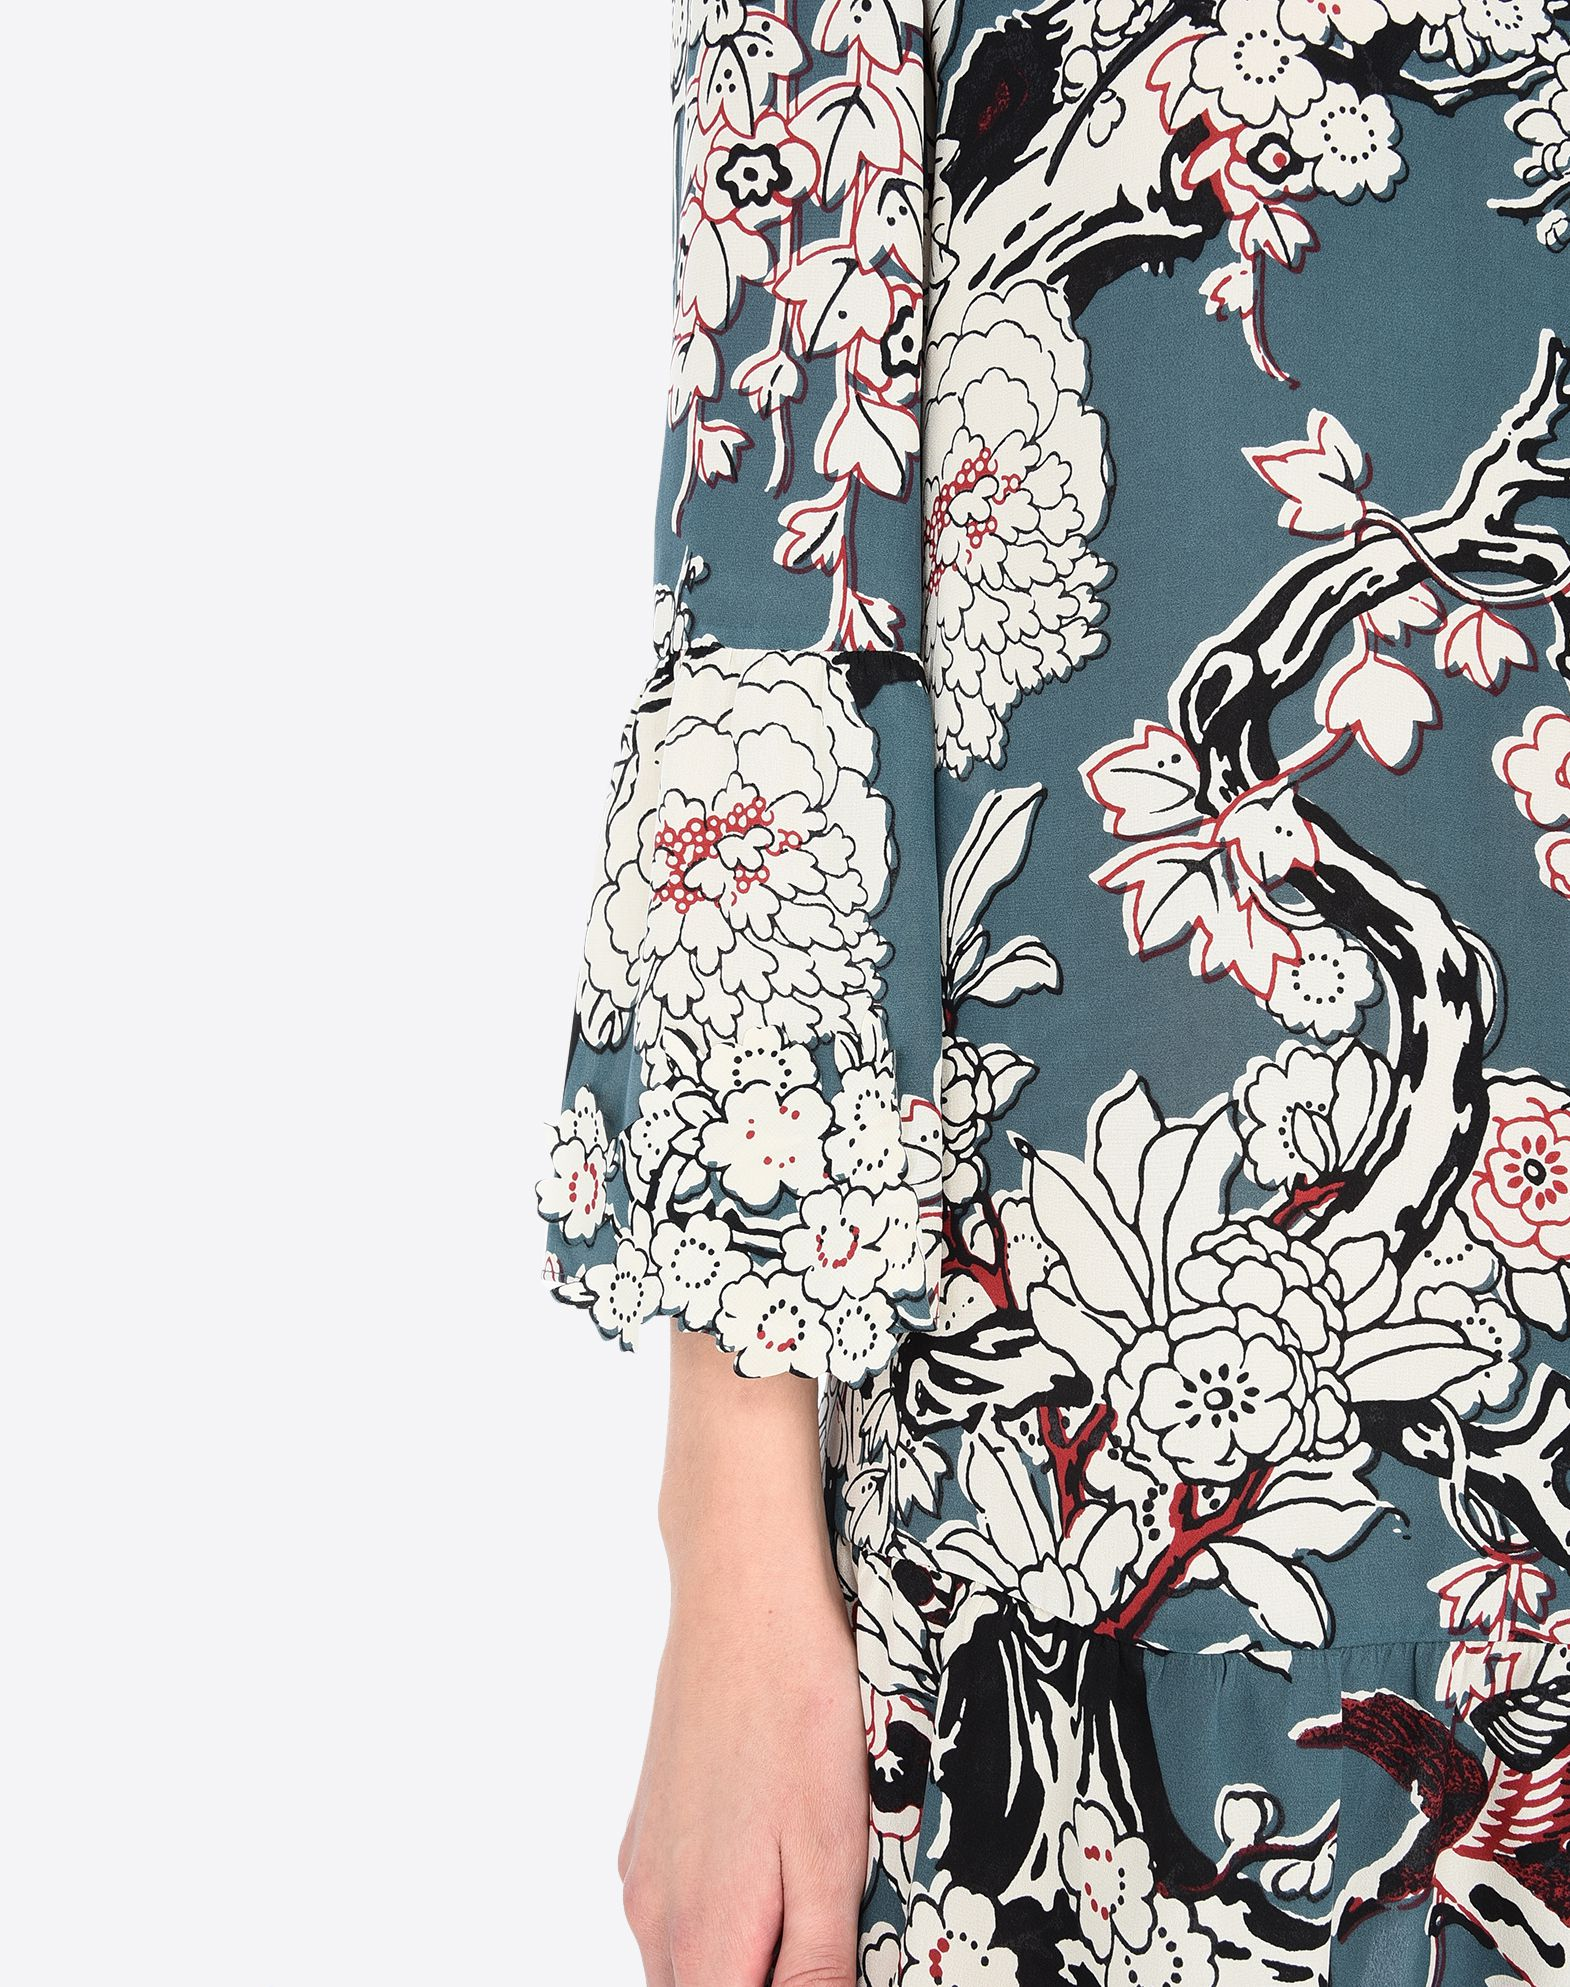 VALENTINO Frills Floral design Turtleneck Rear zip closure Lined interior  34660797jt